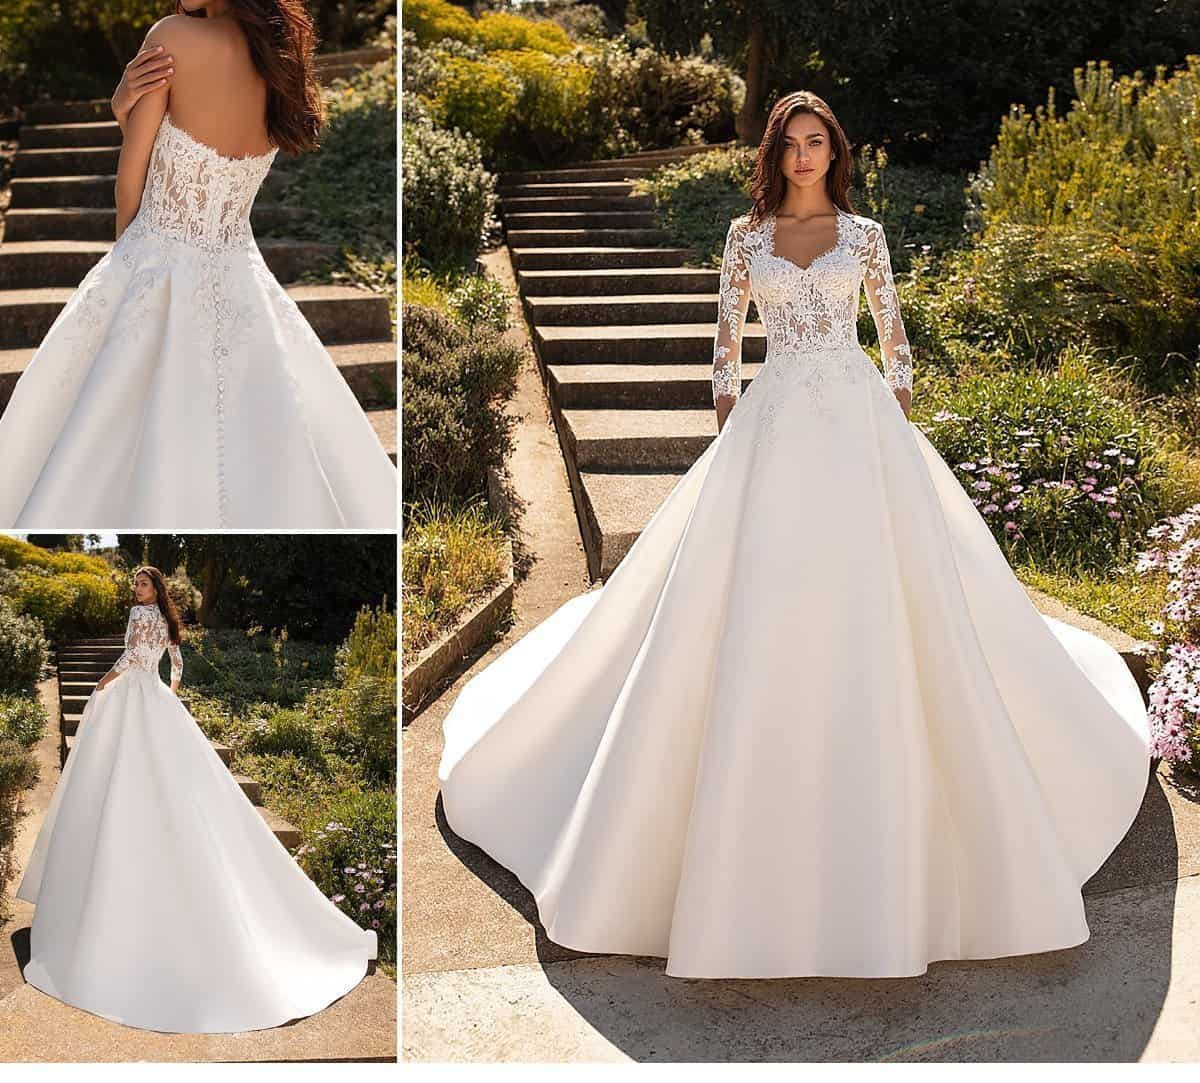 Garden Wedding Gowns: Pronovias Garden Wedding Bridal Dresses 2020